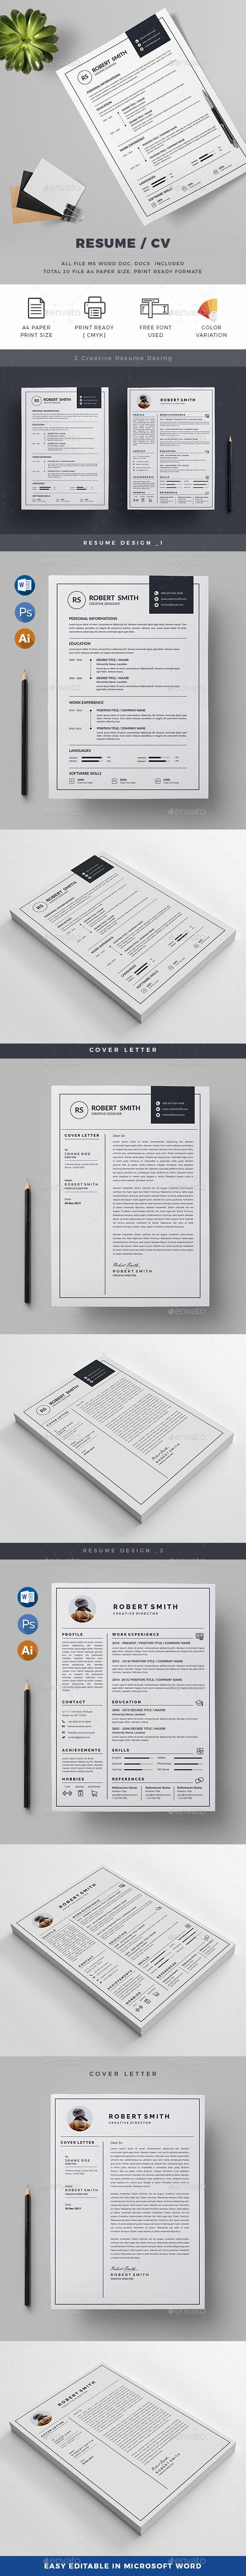 Resume/CV | Resume cv, Template and Cv template